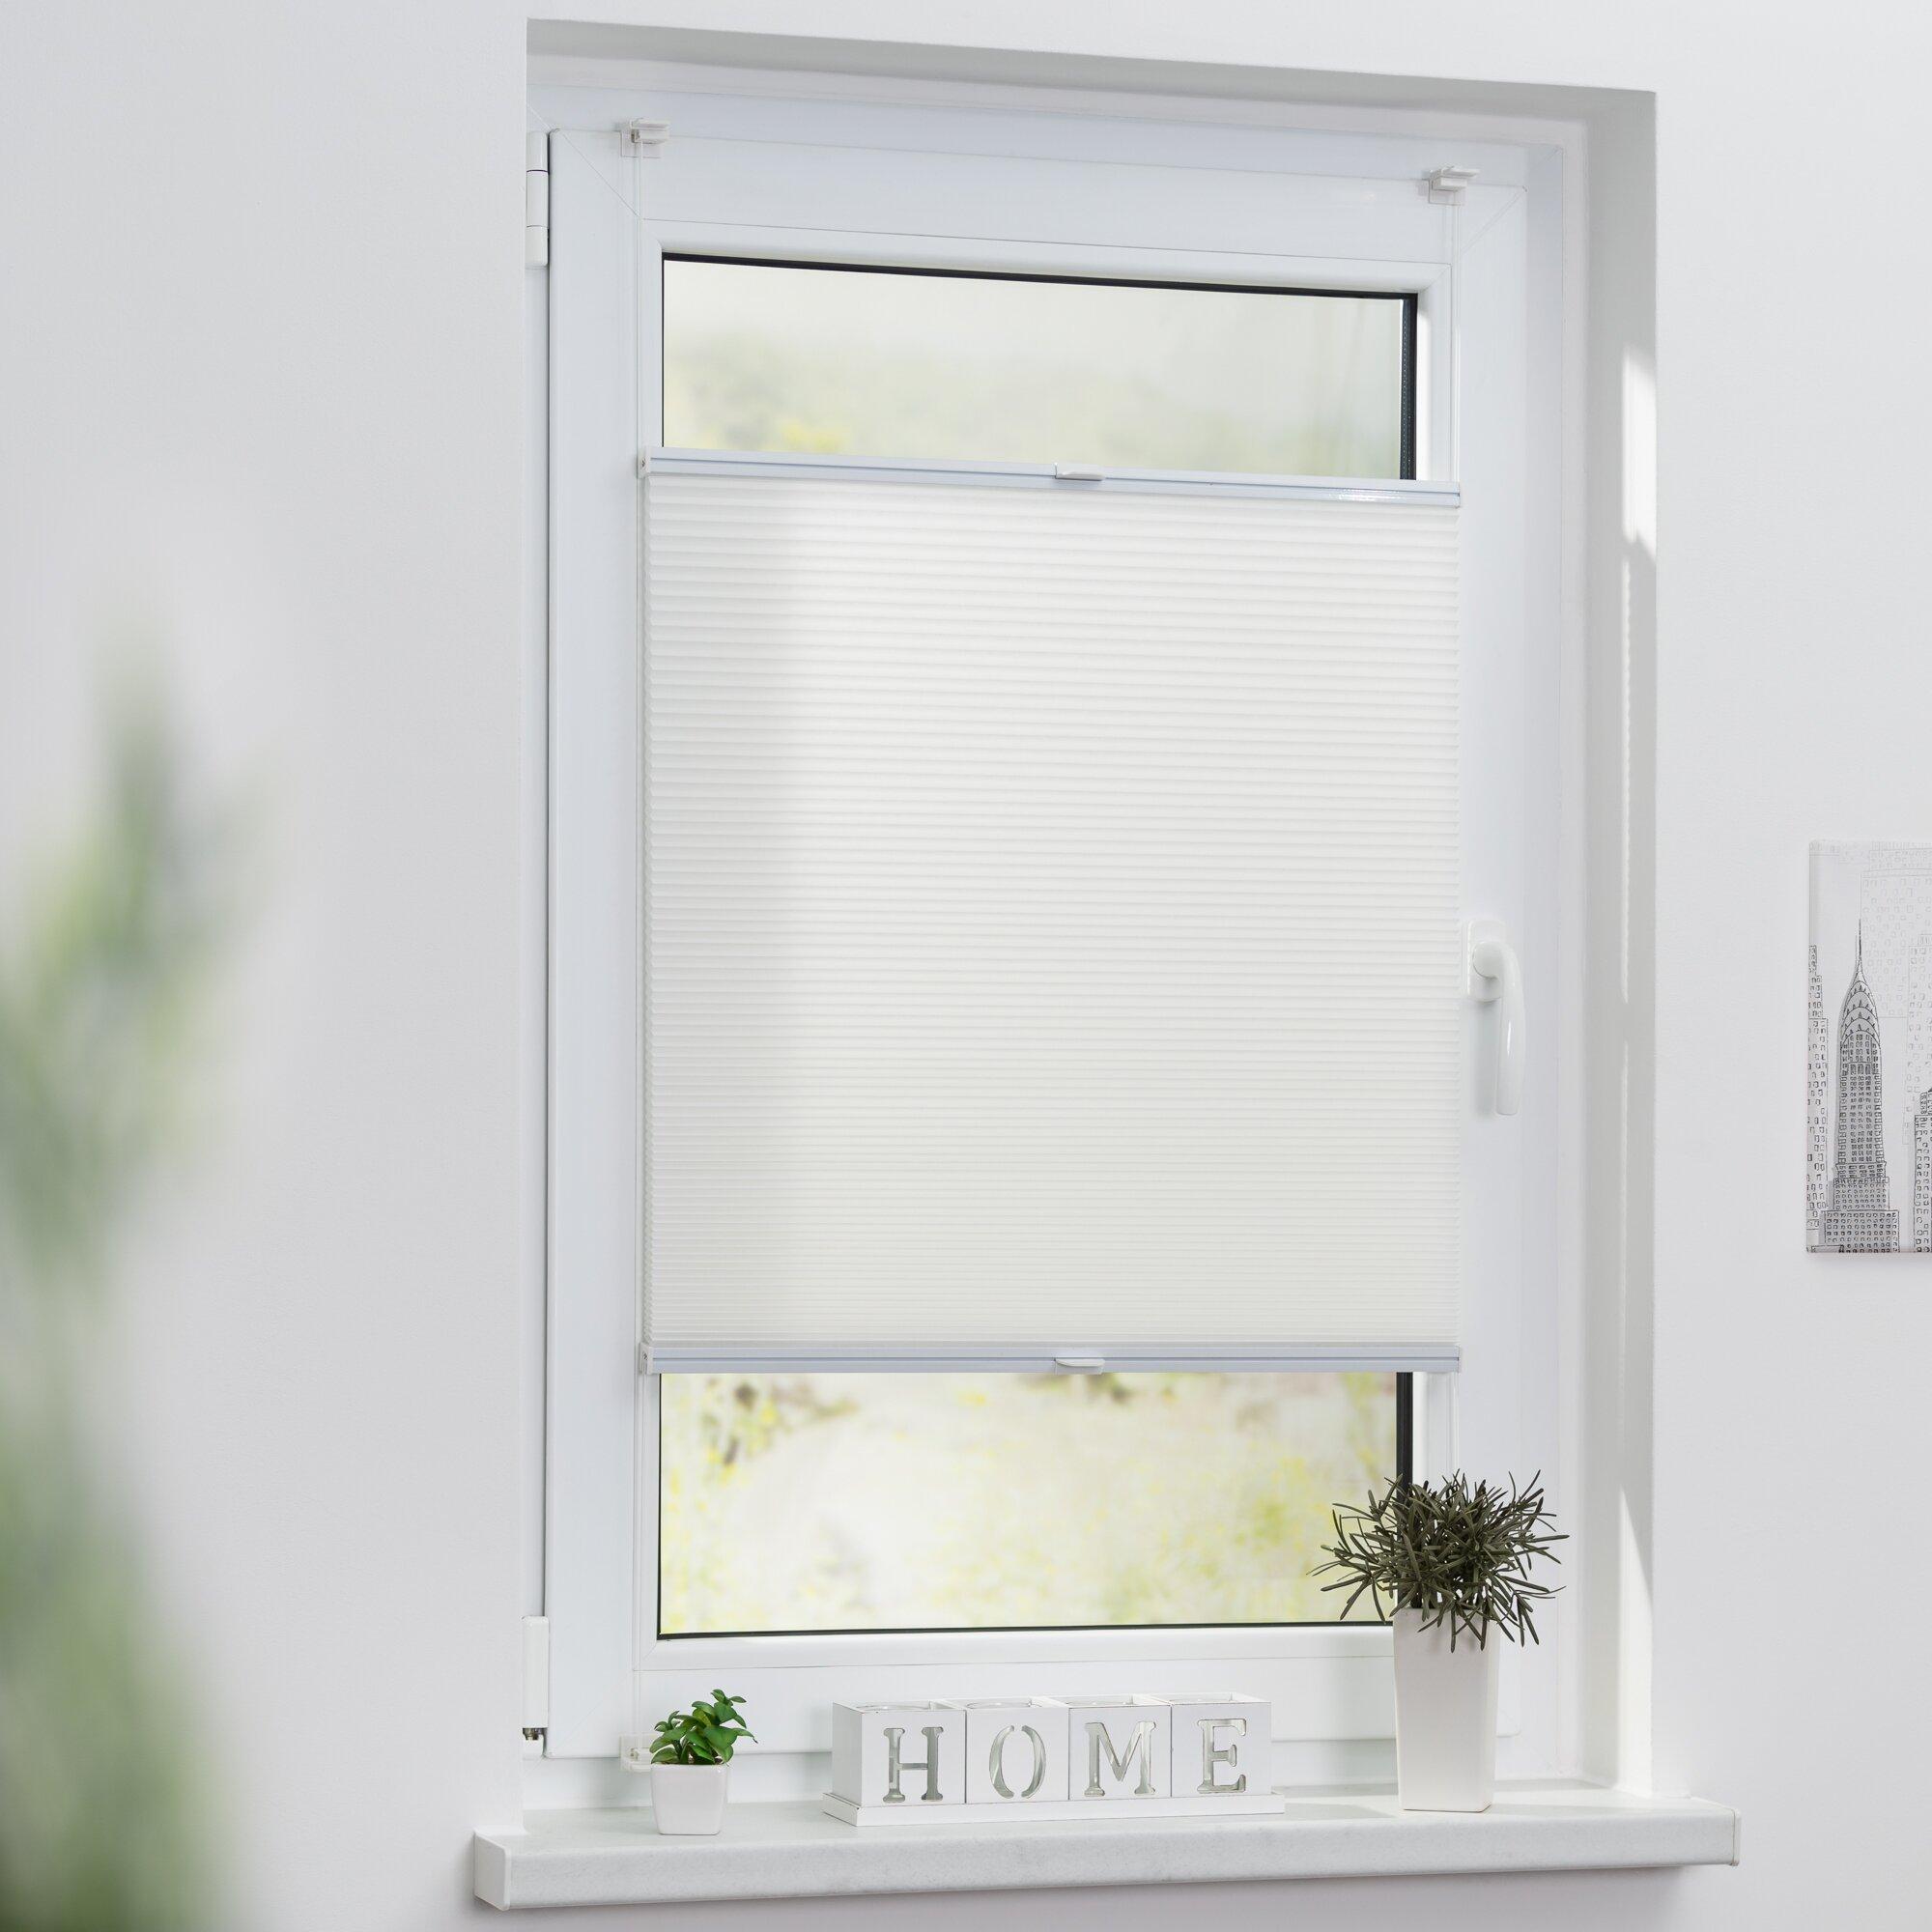 lichtblick plissee klemmfix top. Black Bedroom Furniture Sets. Home Design Ideas